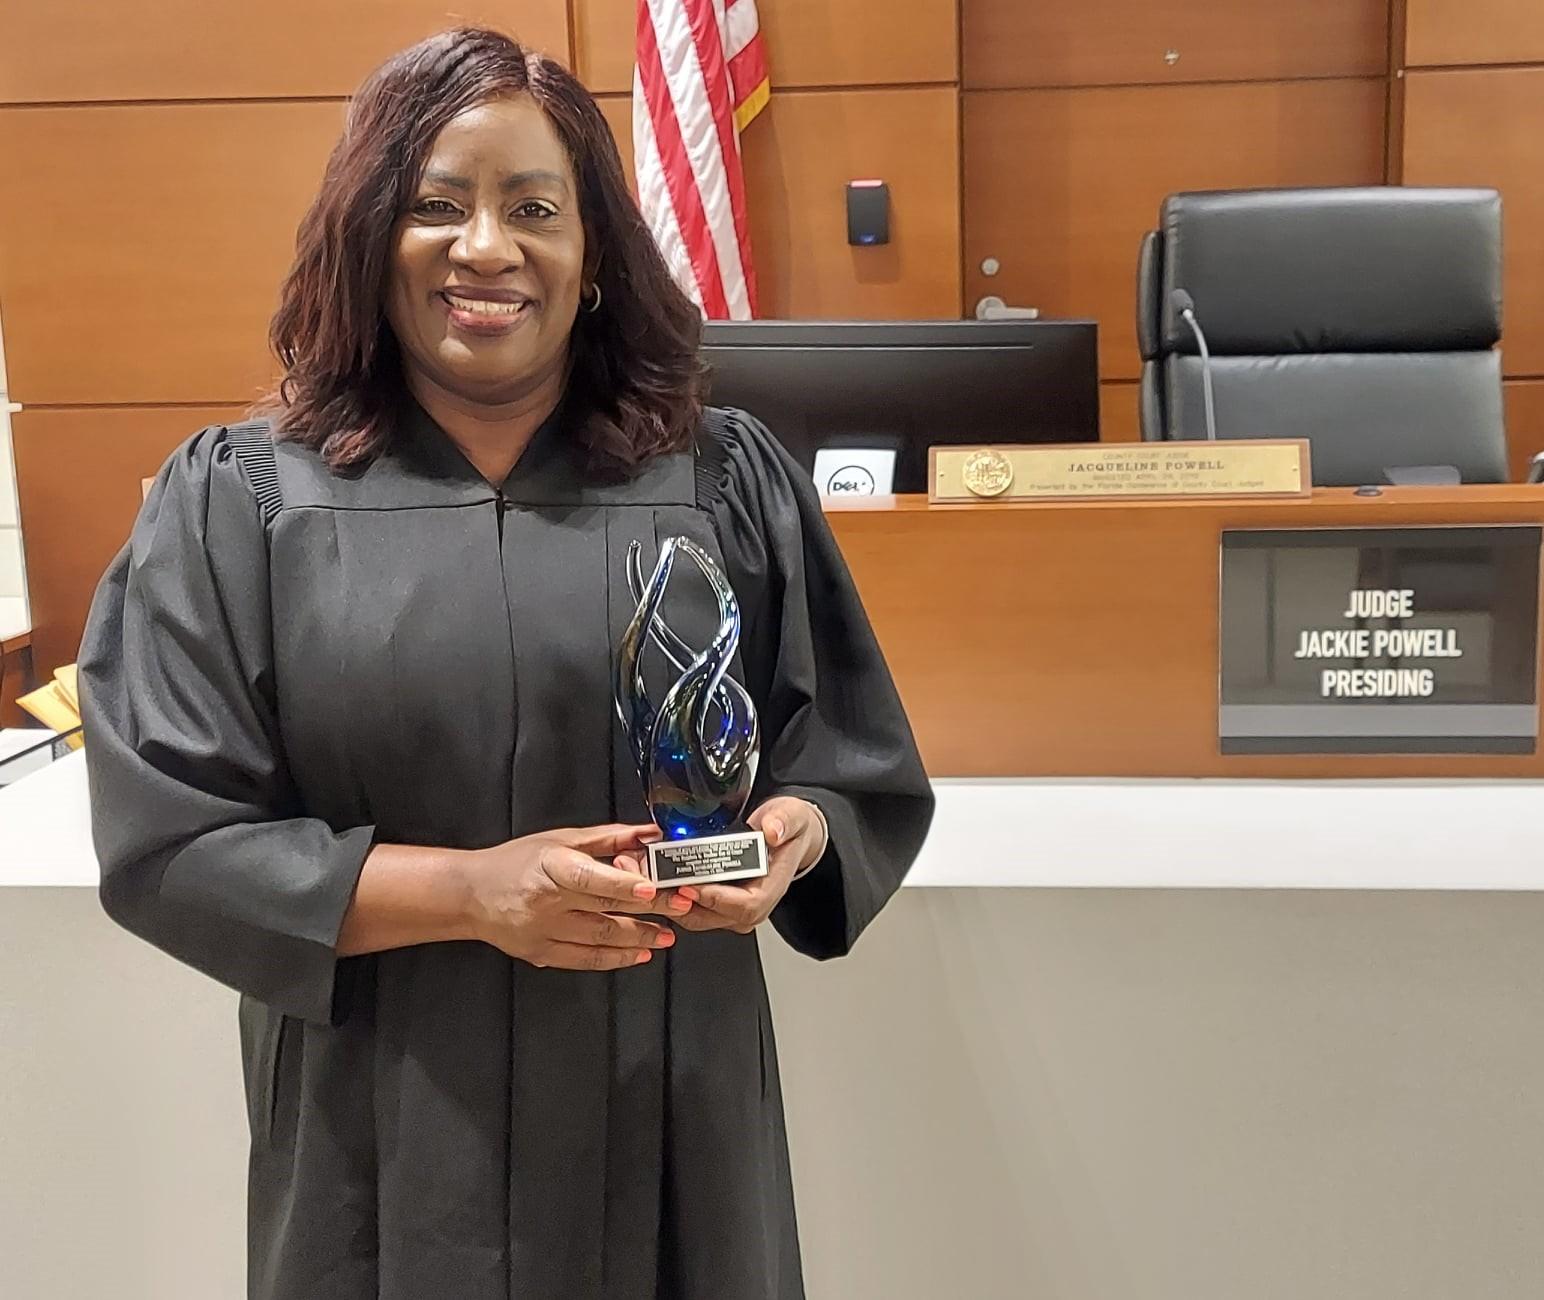 Judge Jackie Powell